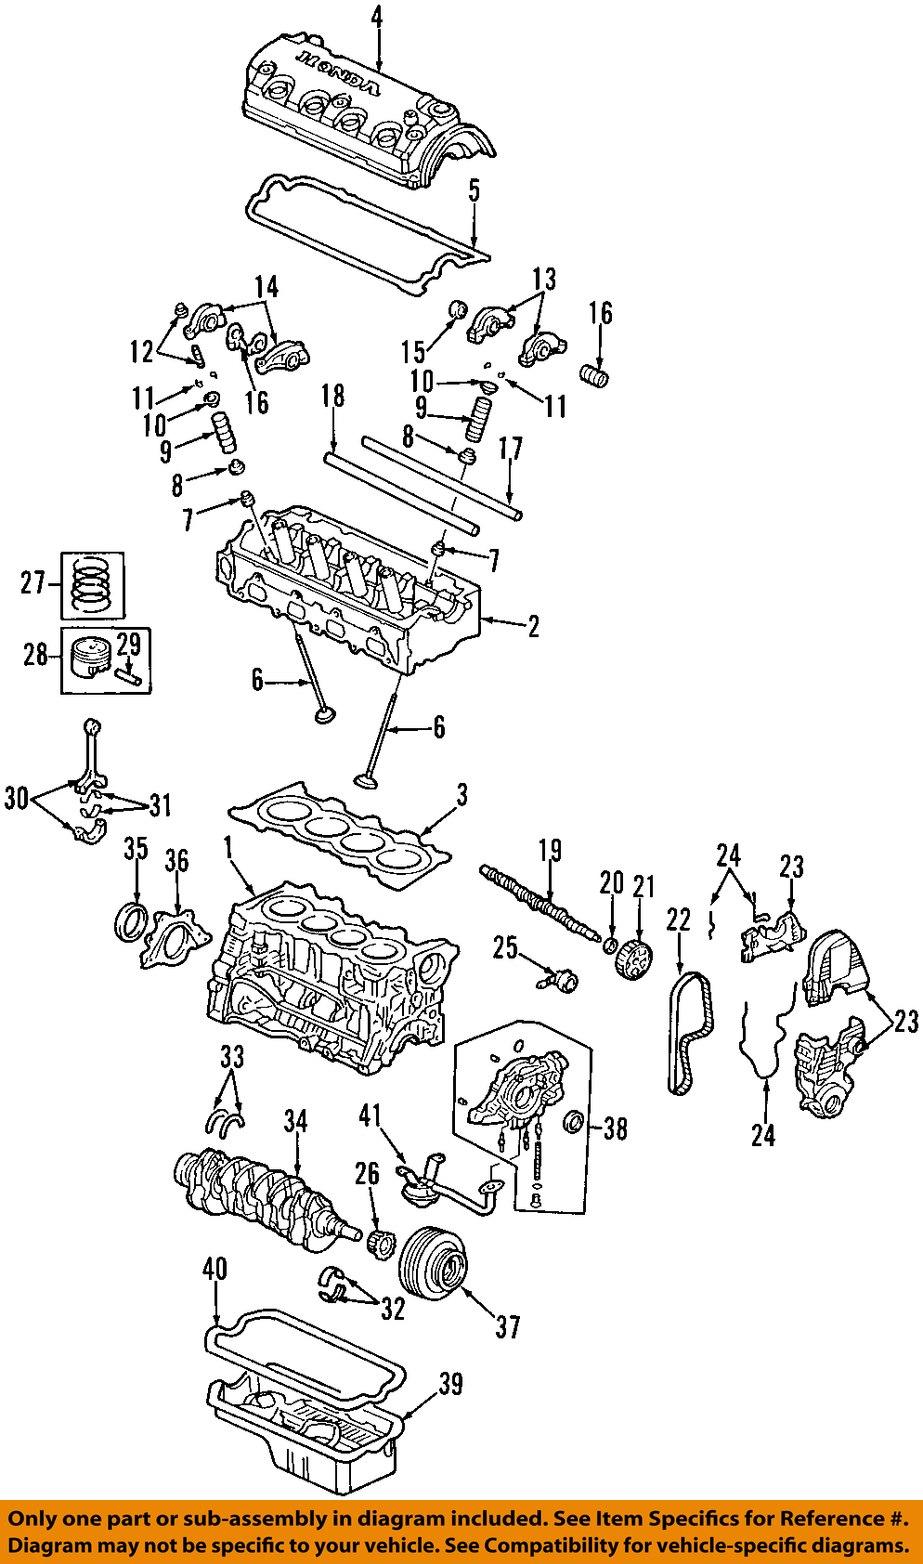 1994 honda civic engine diagram wiring diagram experts